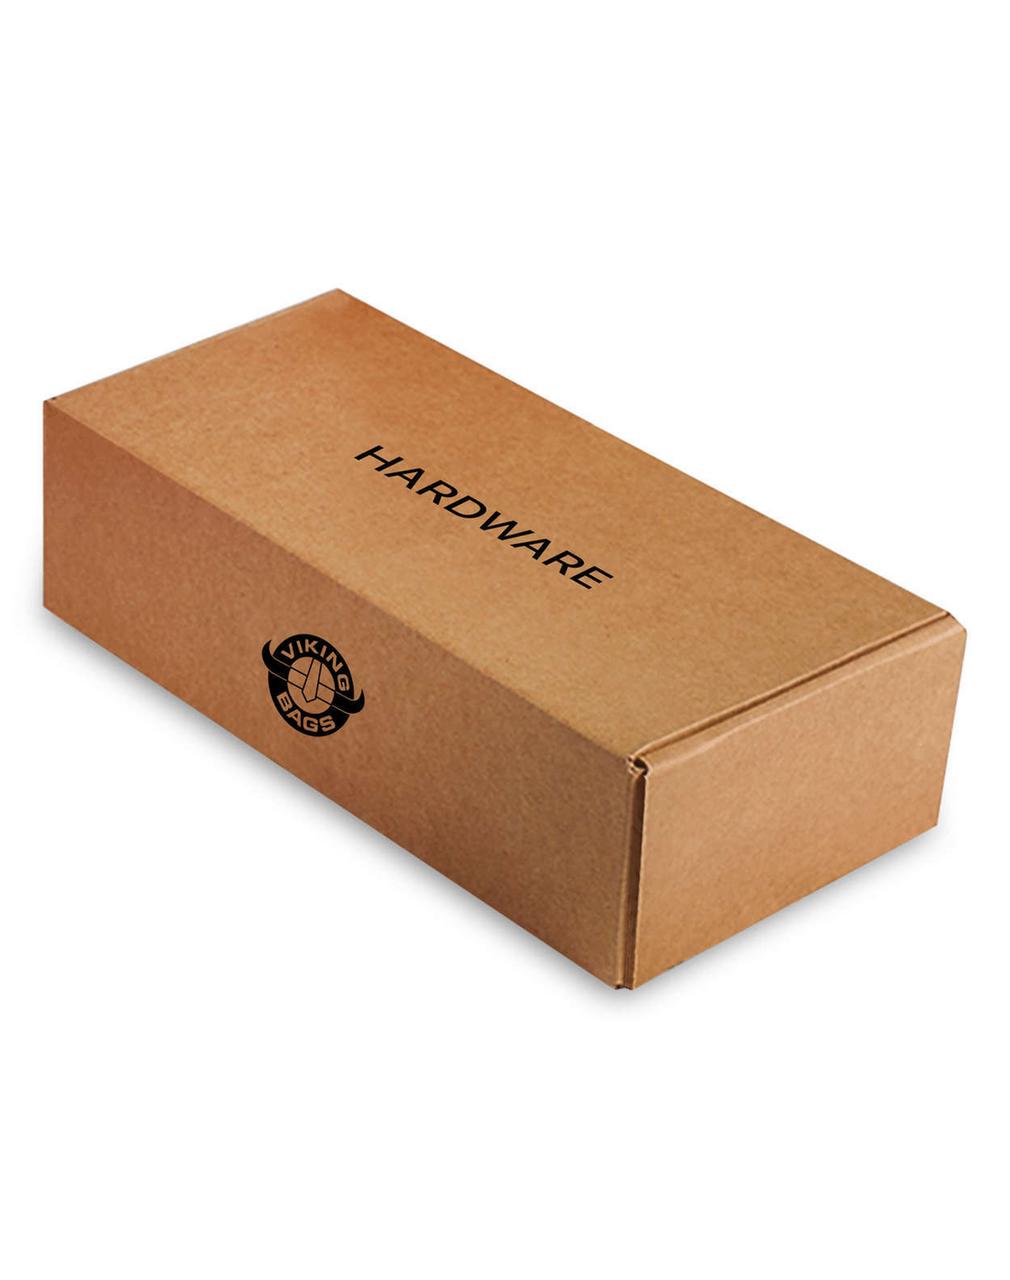 Honda VTX 1800 R (Retro) Viking Lamellar Slanted Leather Covered Motorcycle Hard Saddlebags Hardware Box